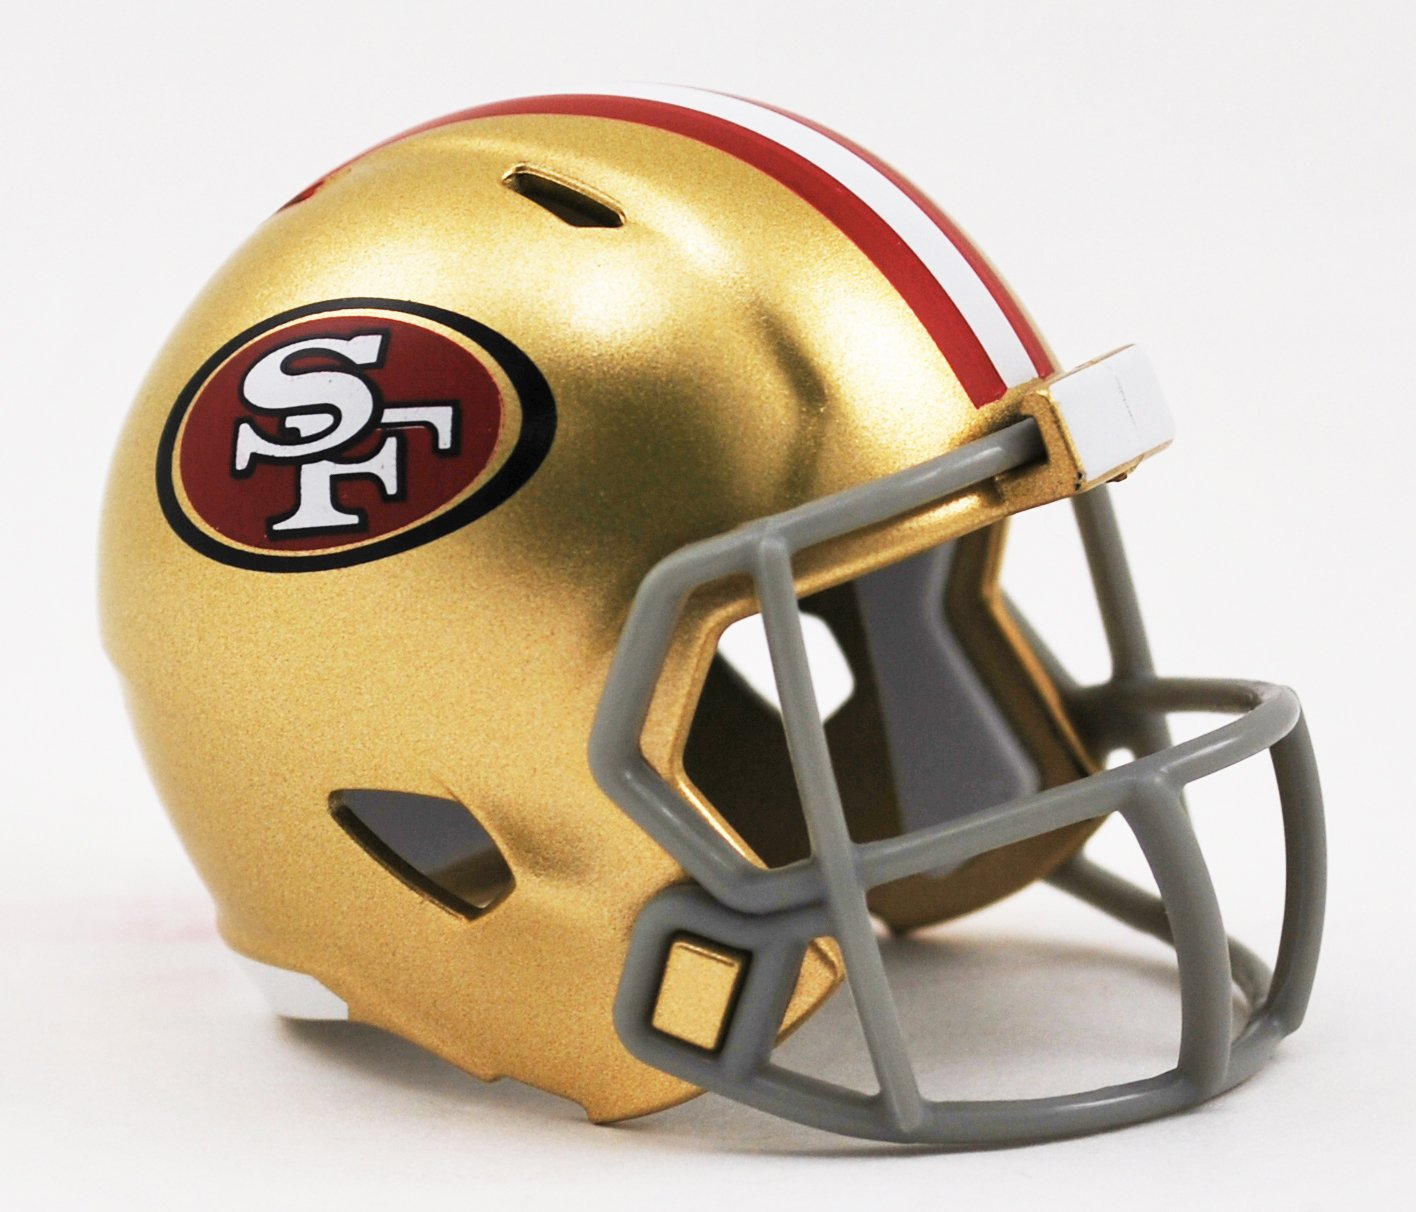 San Francisco 49ers Riddell Speed Pocket Pro Football Helmet New in package